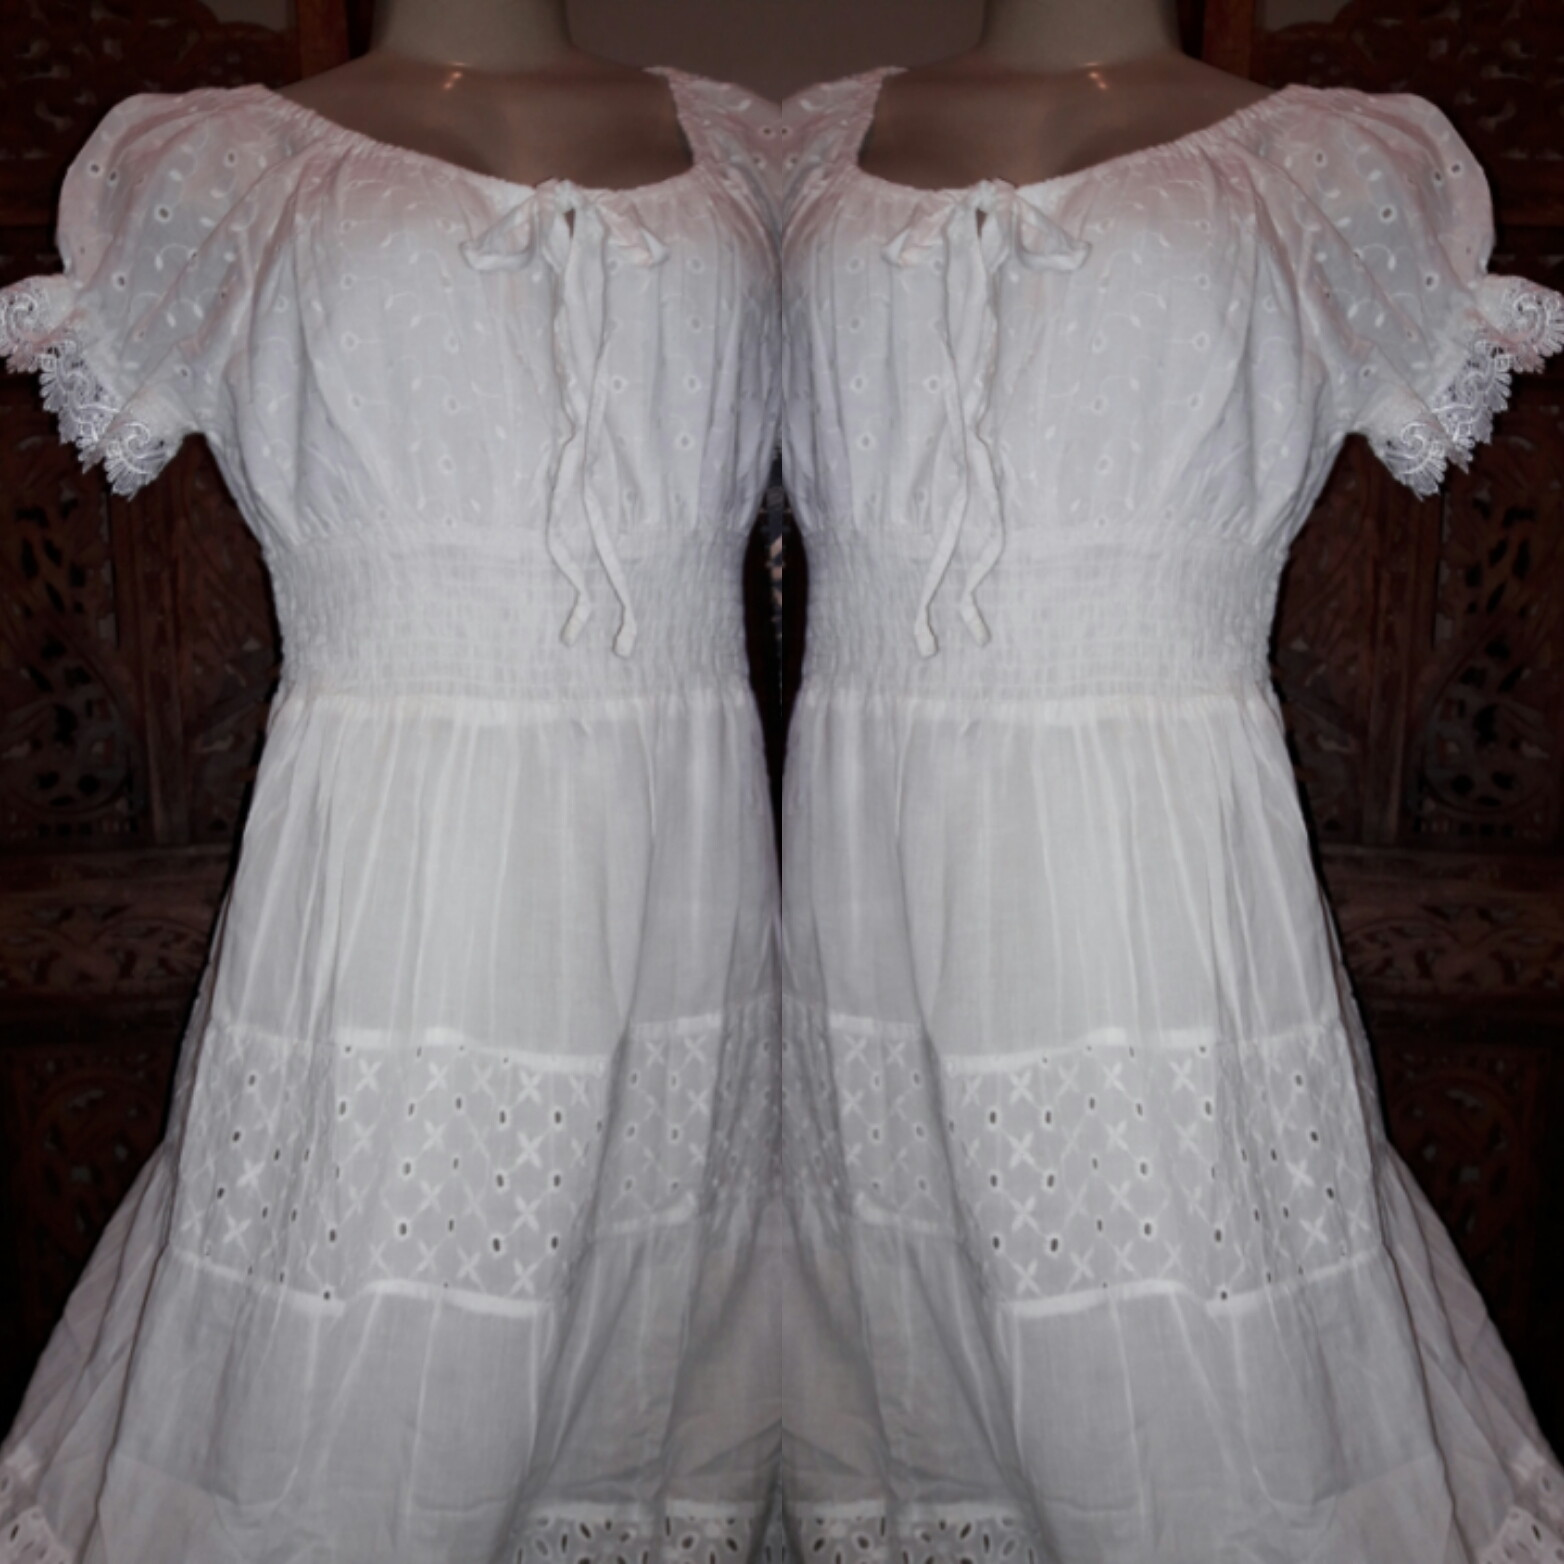 6623440af Vestido Branco Lese Retro Festa Promocao | Elo7